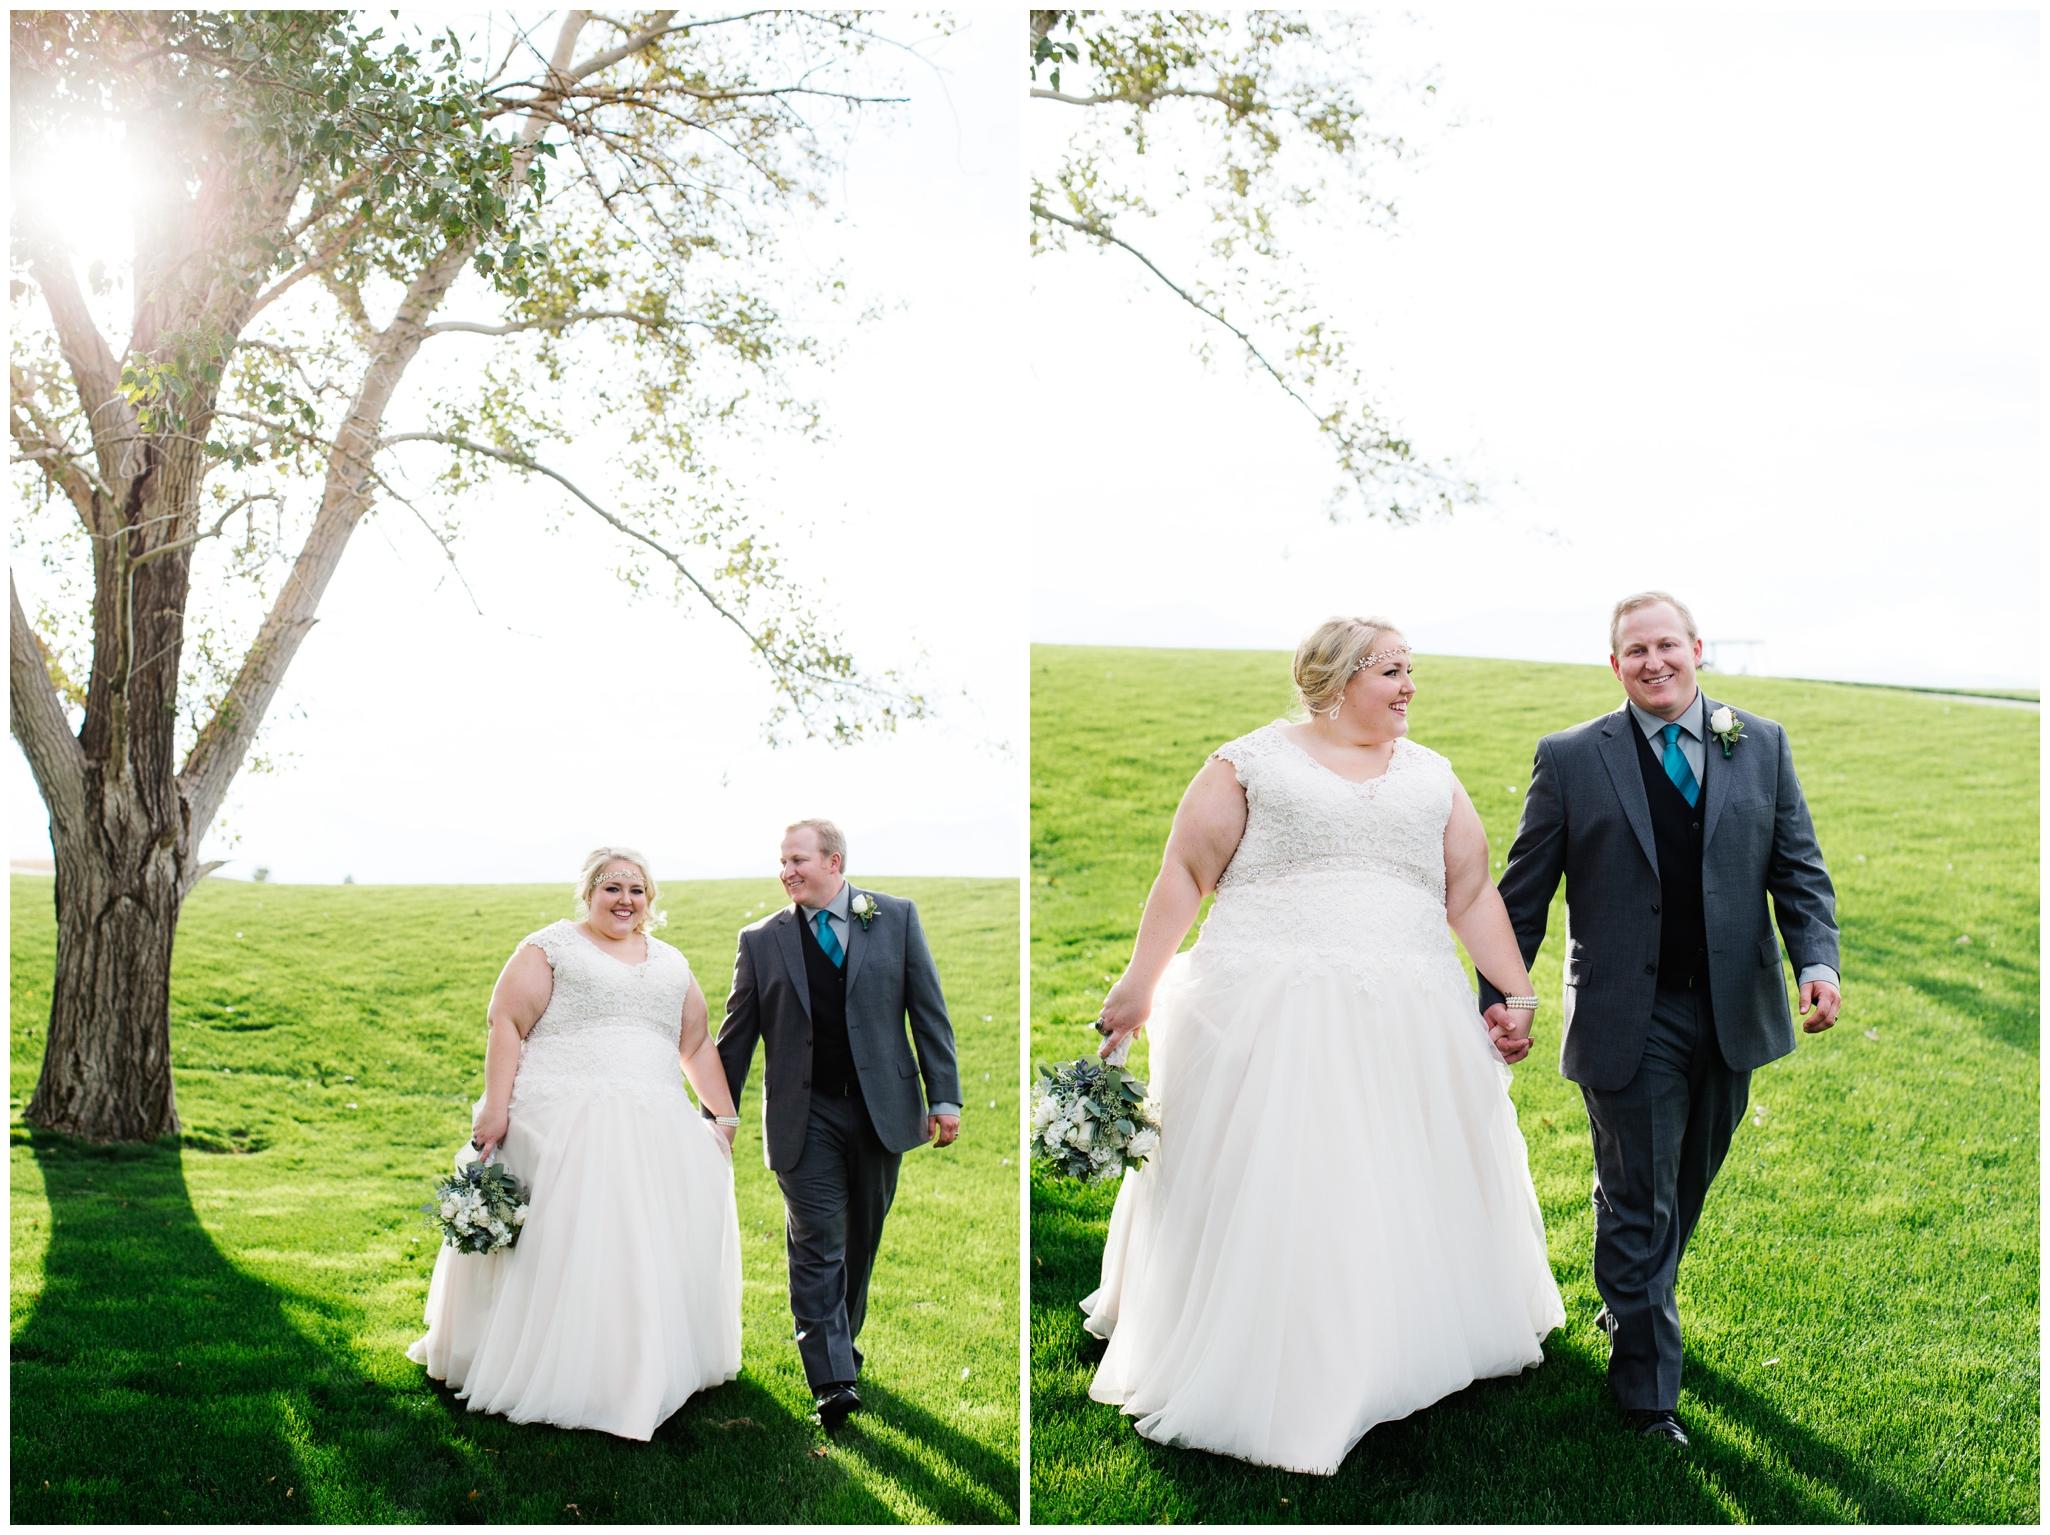 ChrisLeslie_Wedding_002.jpg